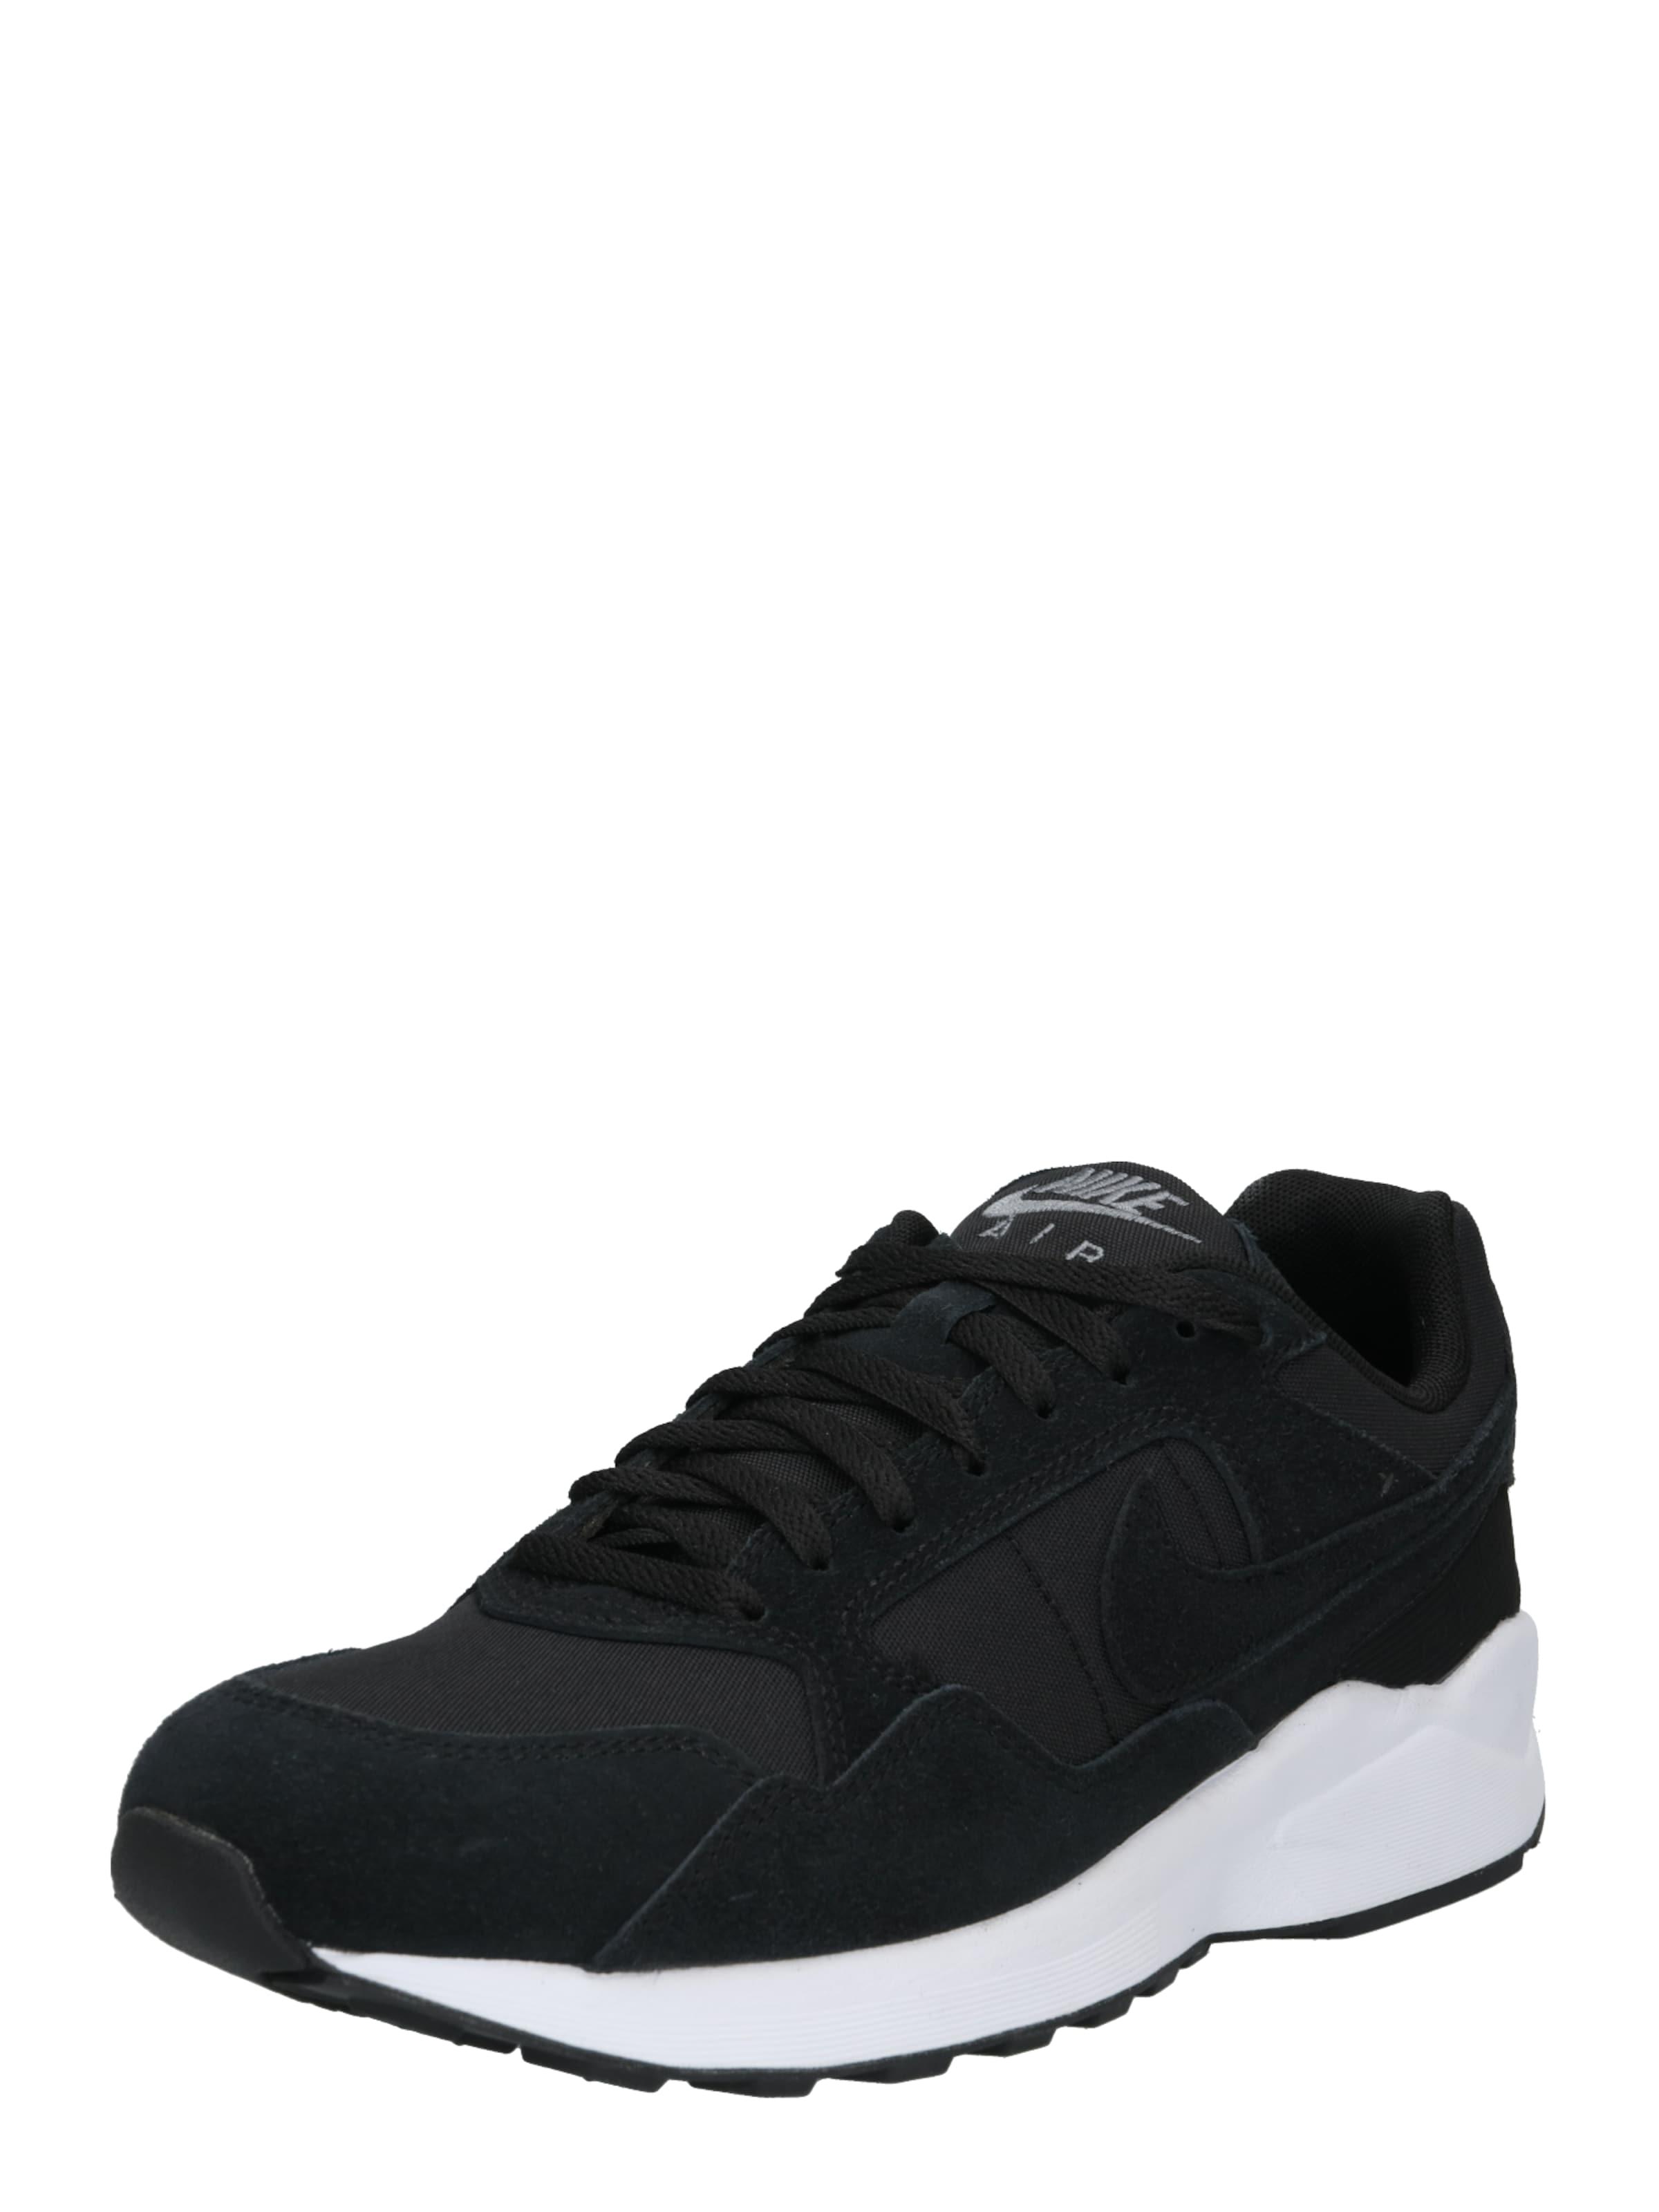 Pegasus Se' '92 Sneaker Sportswear In 'air Nike Lite SchwarzWeiß XuZOkPiT